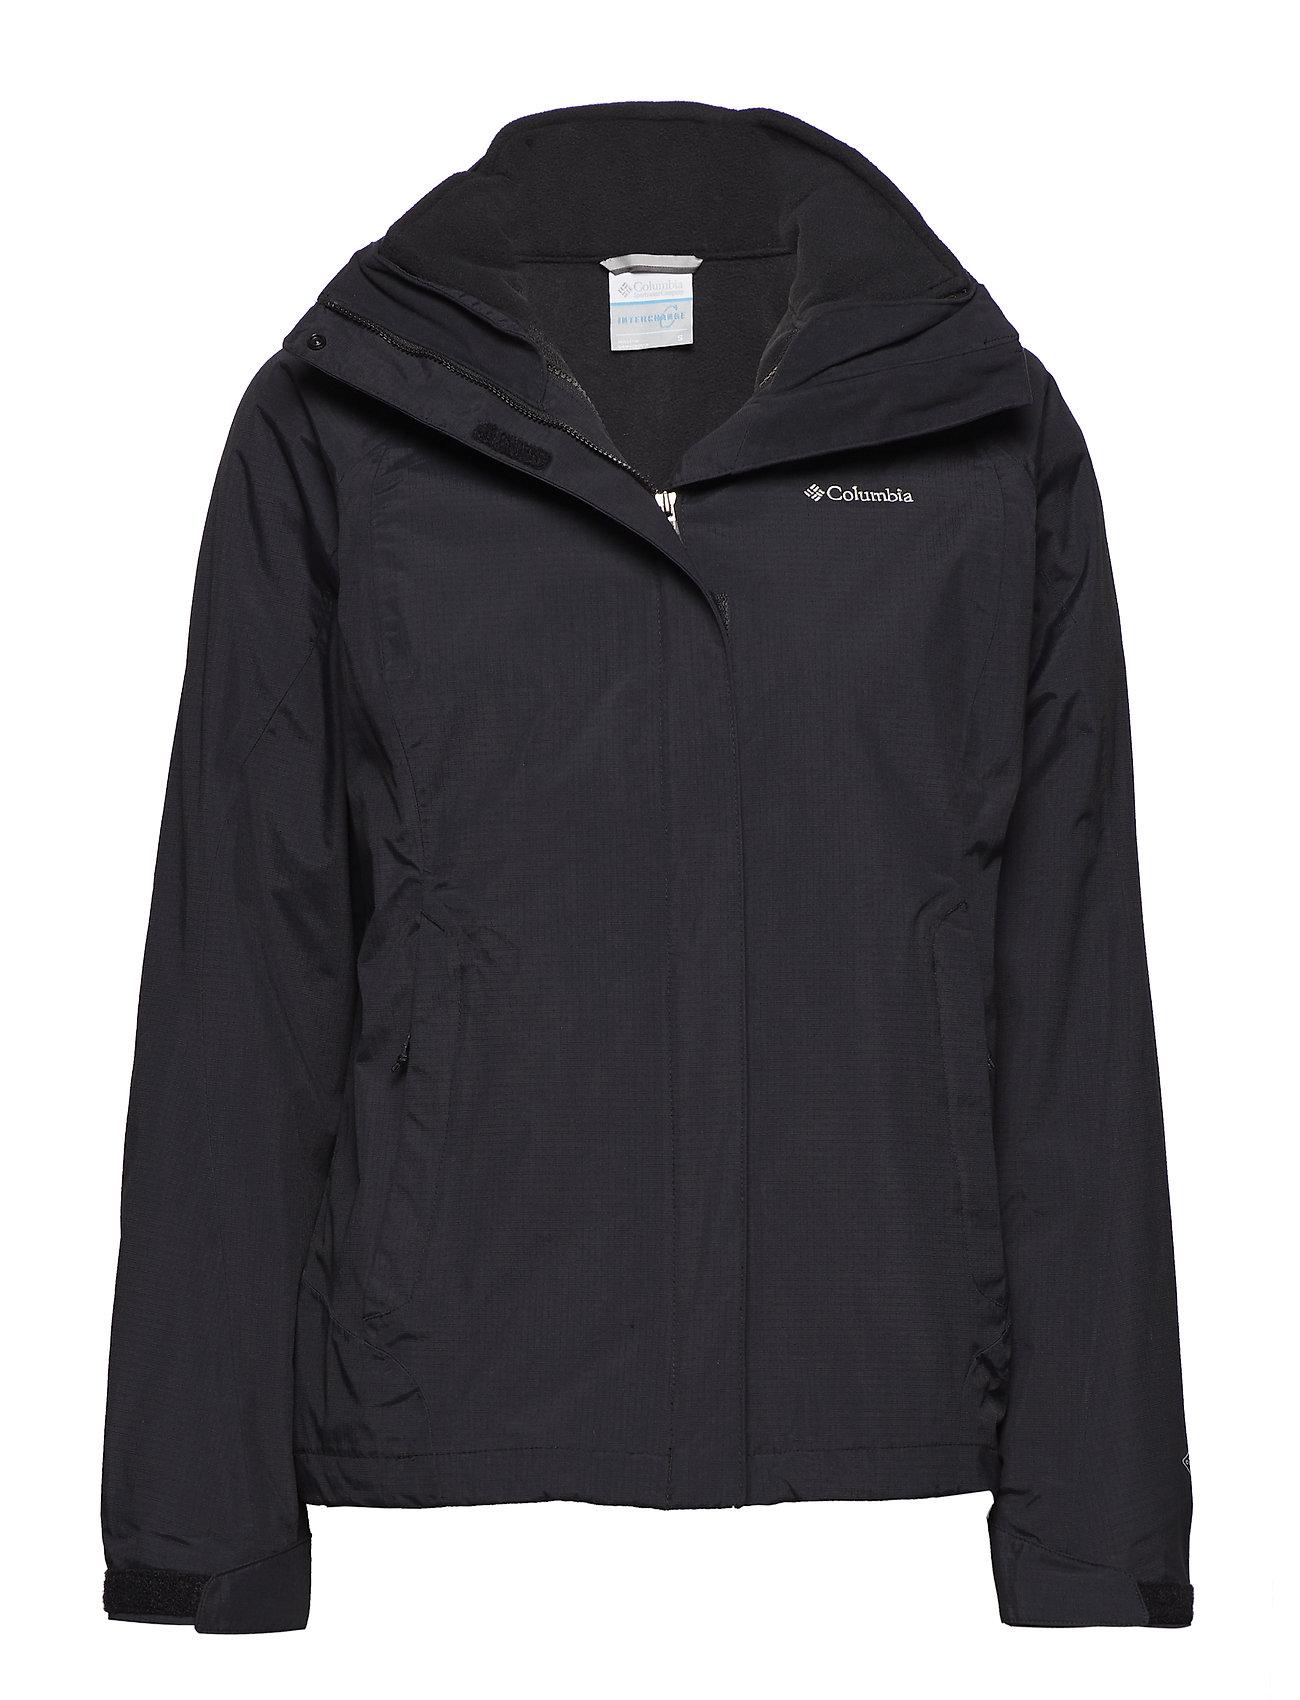 Columbia Venture On™ Interchange Jacket